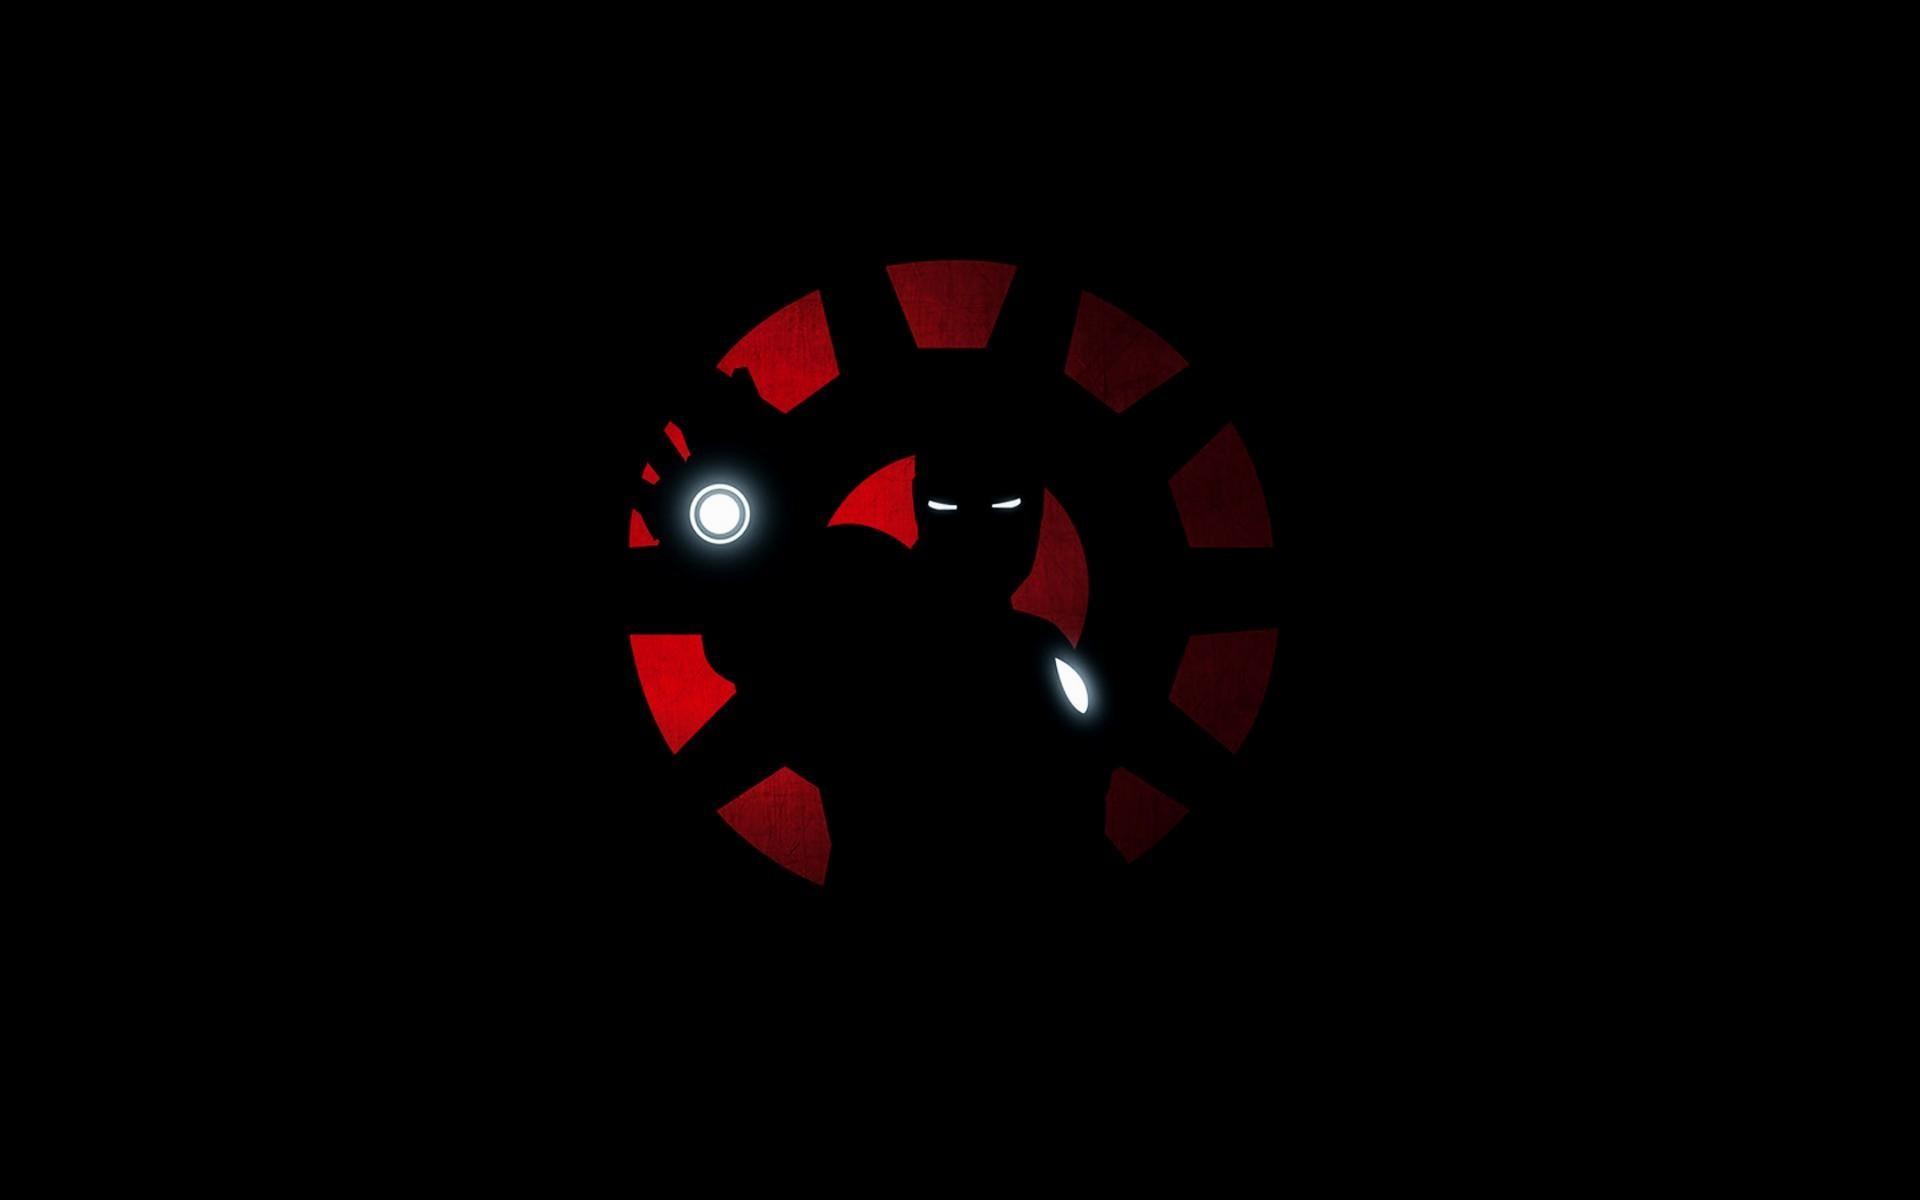 arc reactor wallpaper hd 75 images